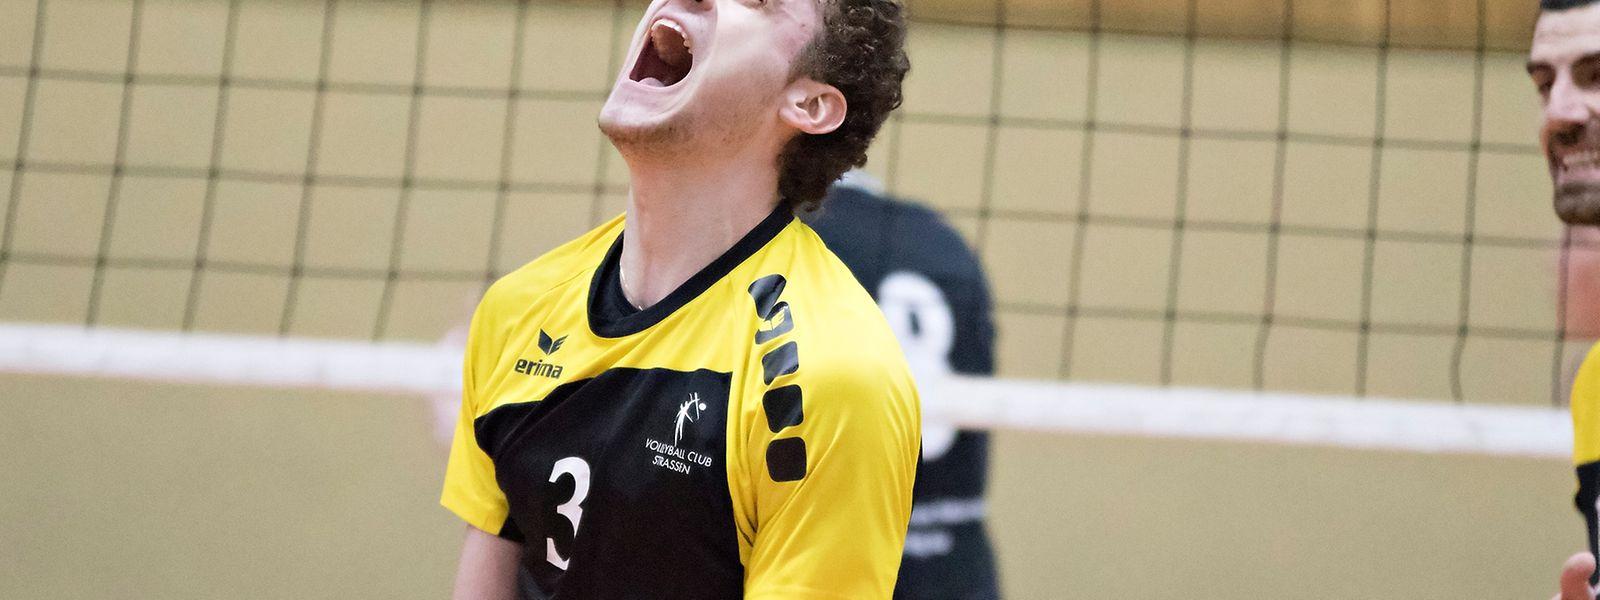 Kamil Rychlicki wechselt nach Belgien